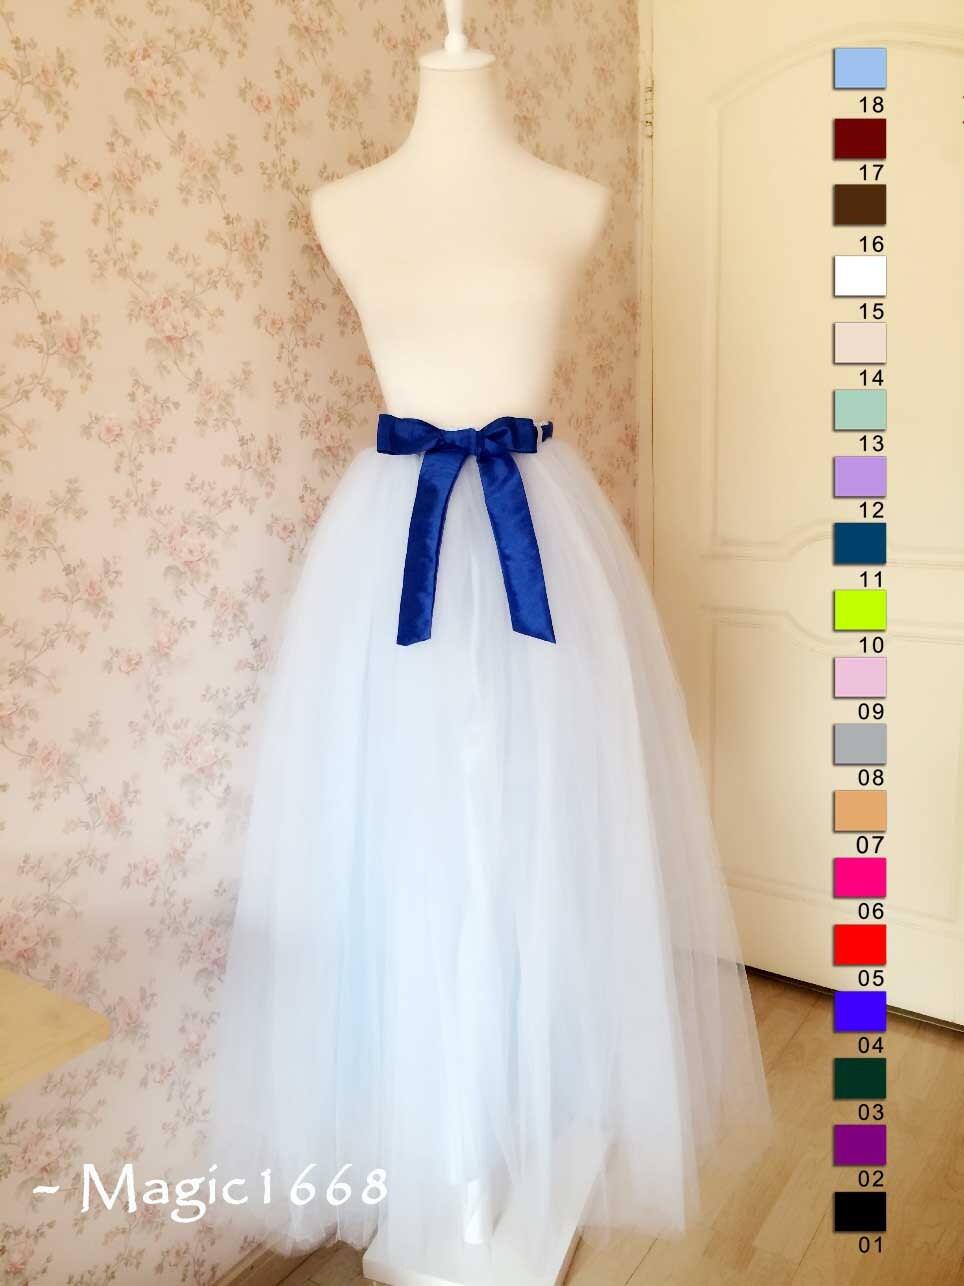 a8e4d2ddc160 Frozen Princess -Maxi Tutu skirt Adult Long Tutu Skirt Women Light Blue  Fairy Wedding Tutus Long Tulle Tutu Adult Women Clothing-magic1668